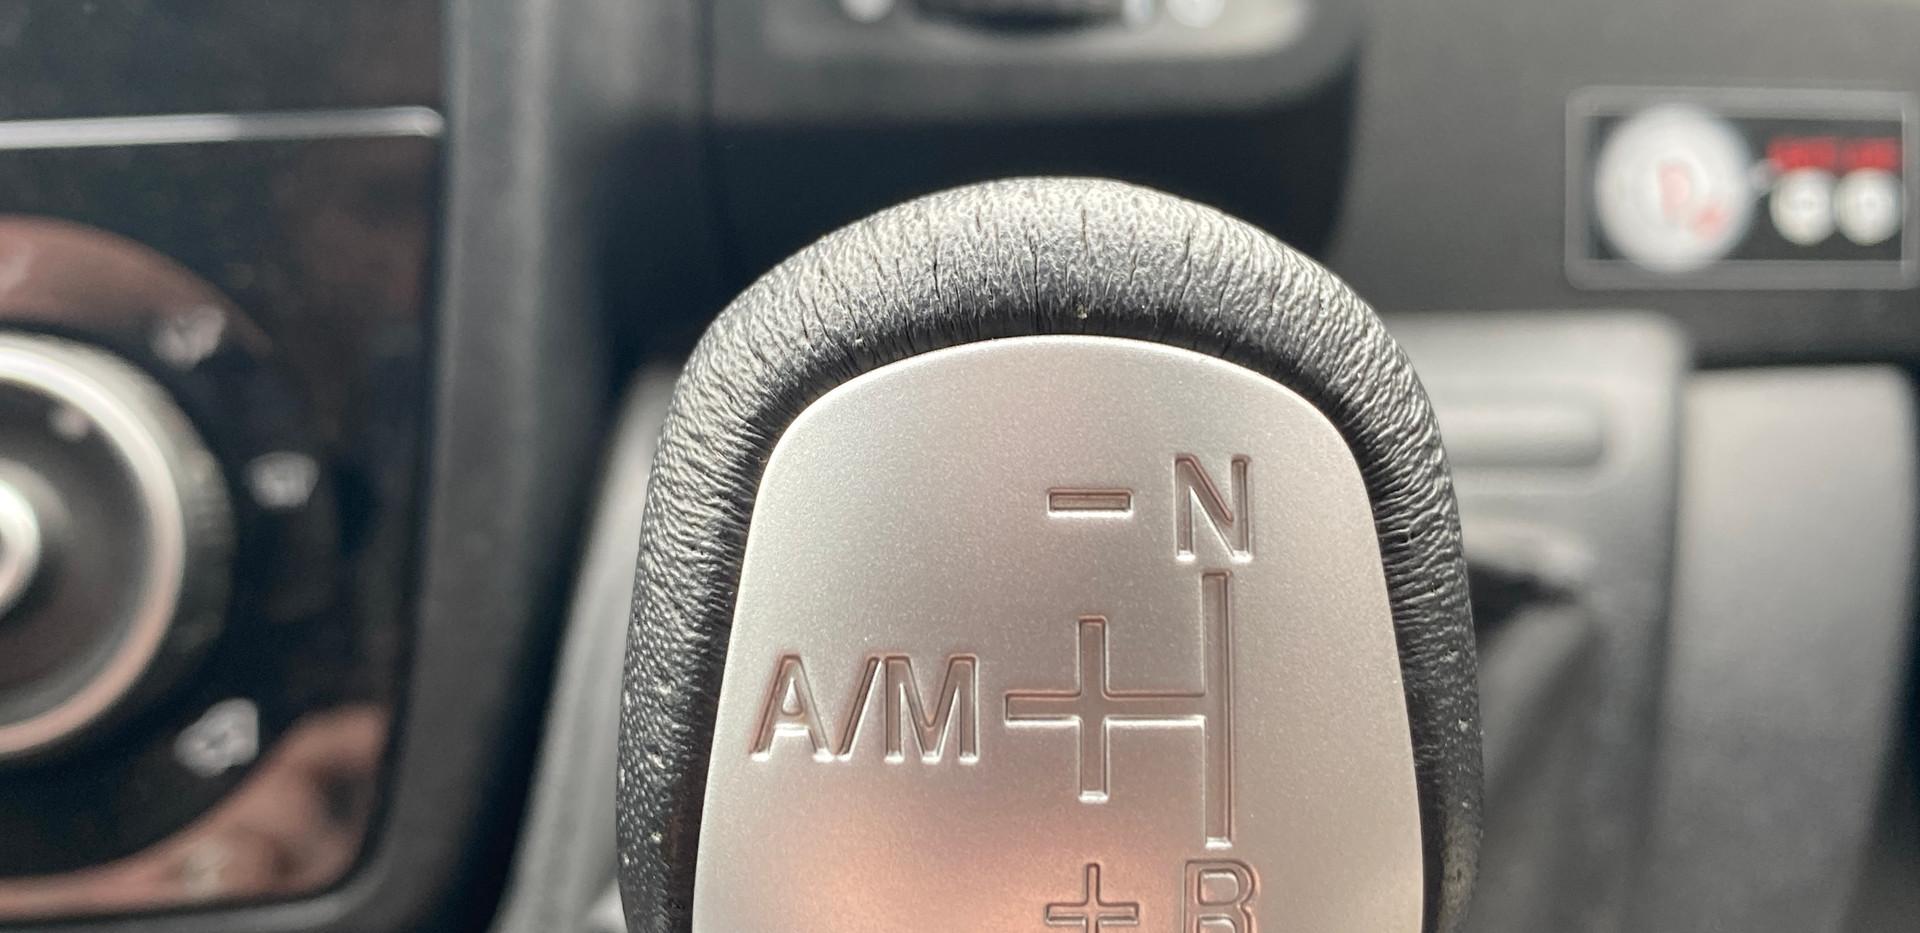 2017 Swift Escape 684 I Motorhome I Coachbuilt I Nuneaton I Warwickshire I UK